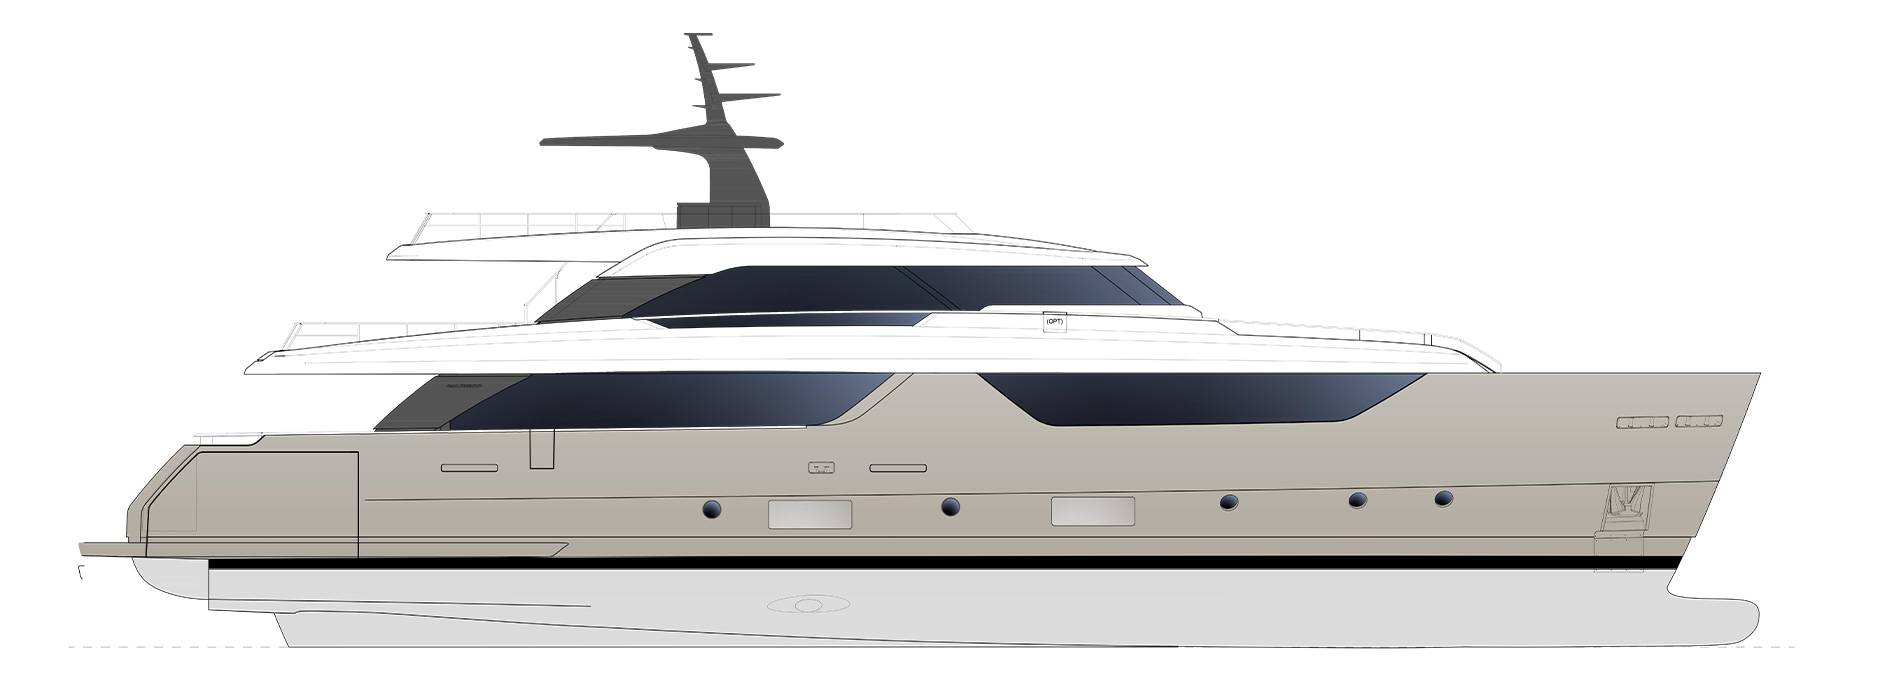 Sanlorenzo Yachts SD118 Perfil